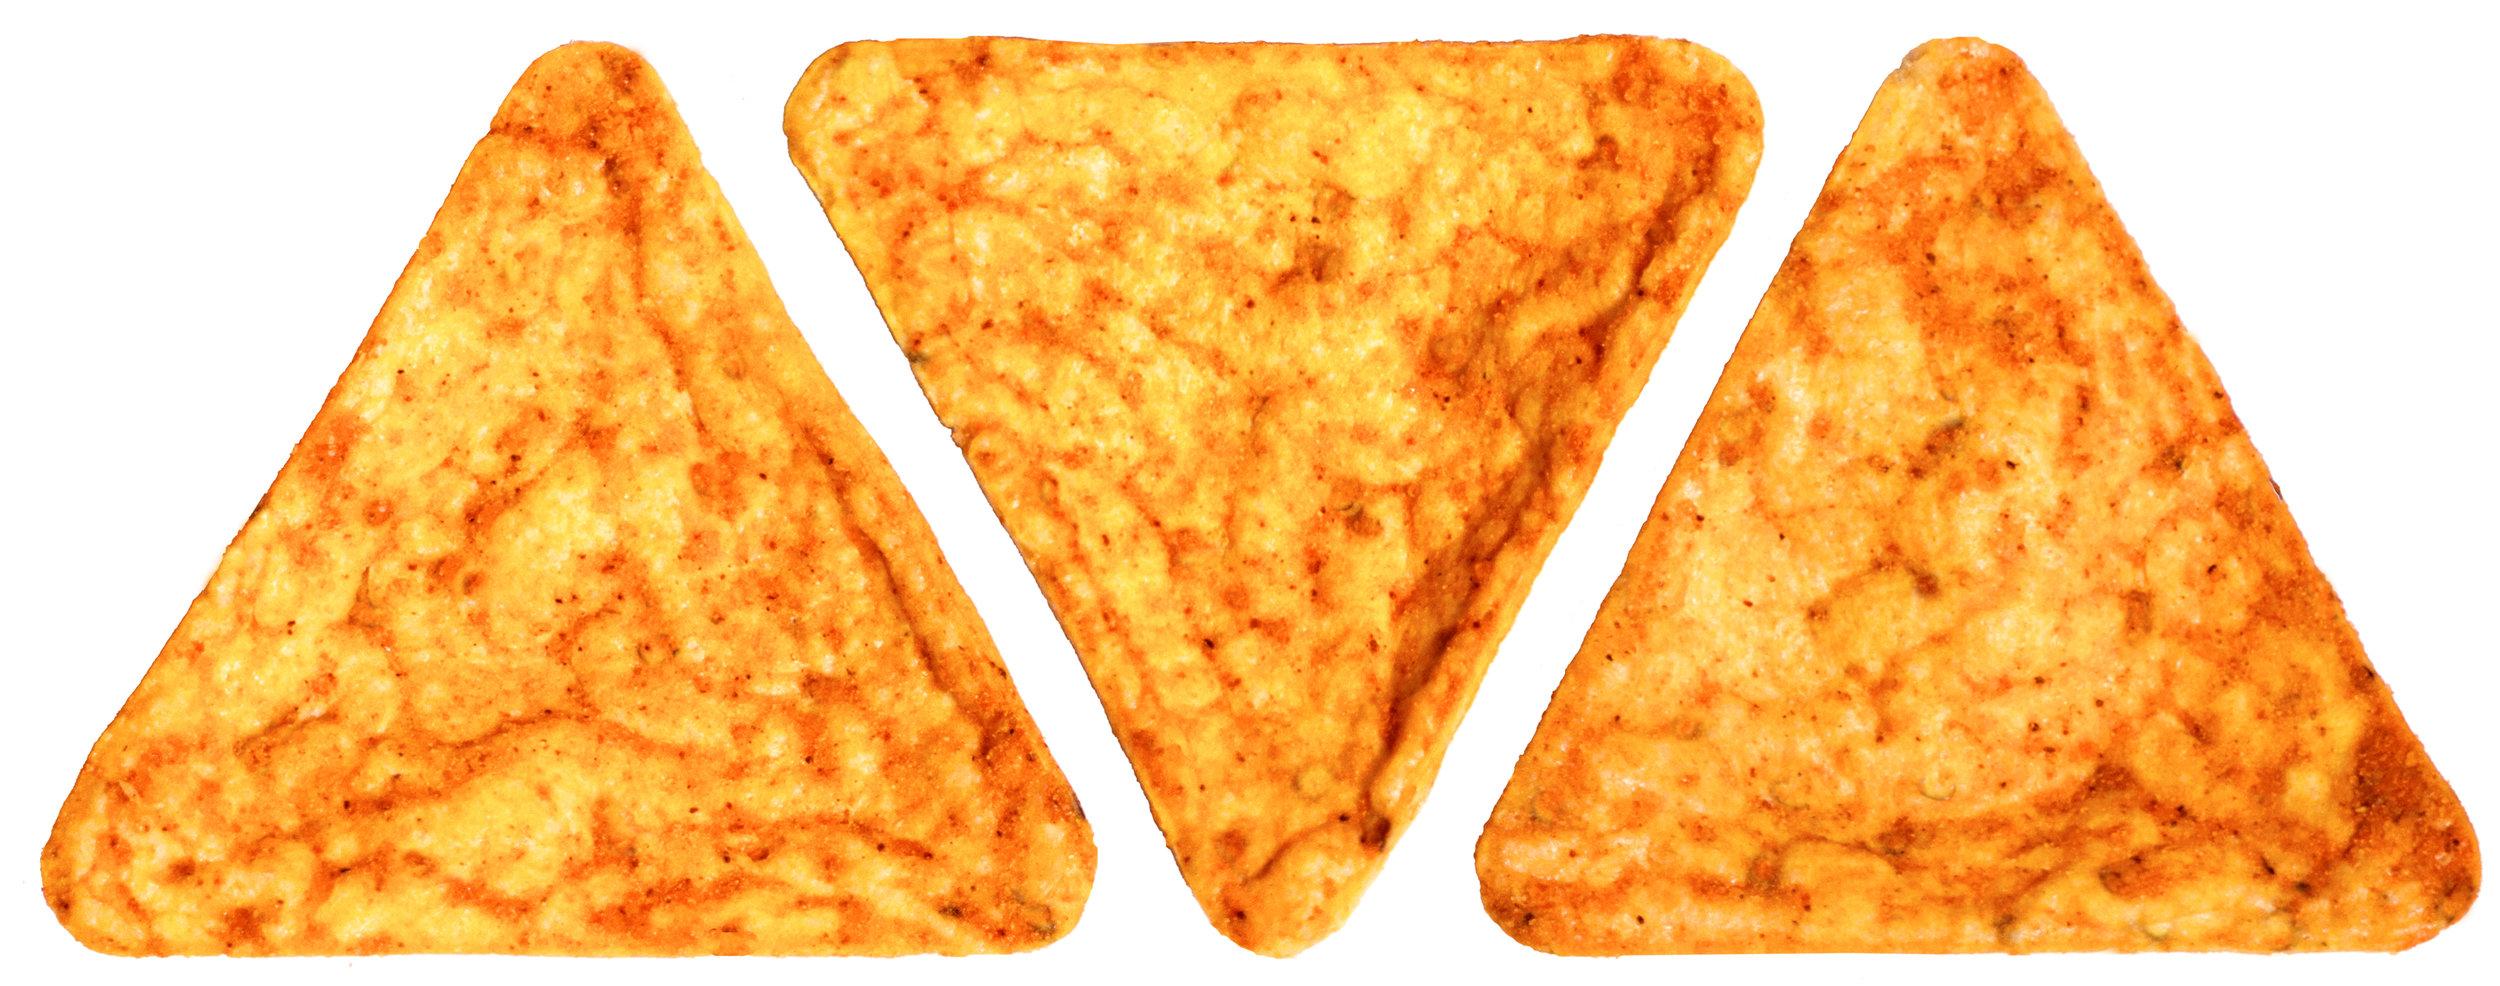 nacho-cheese-tortilla-chips.jpg